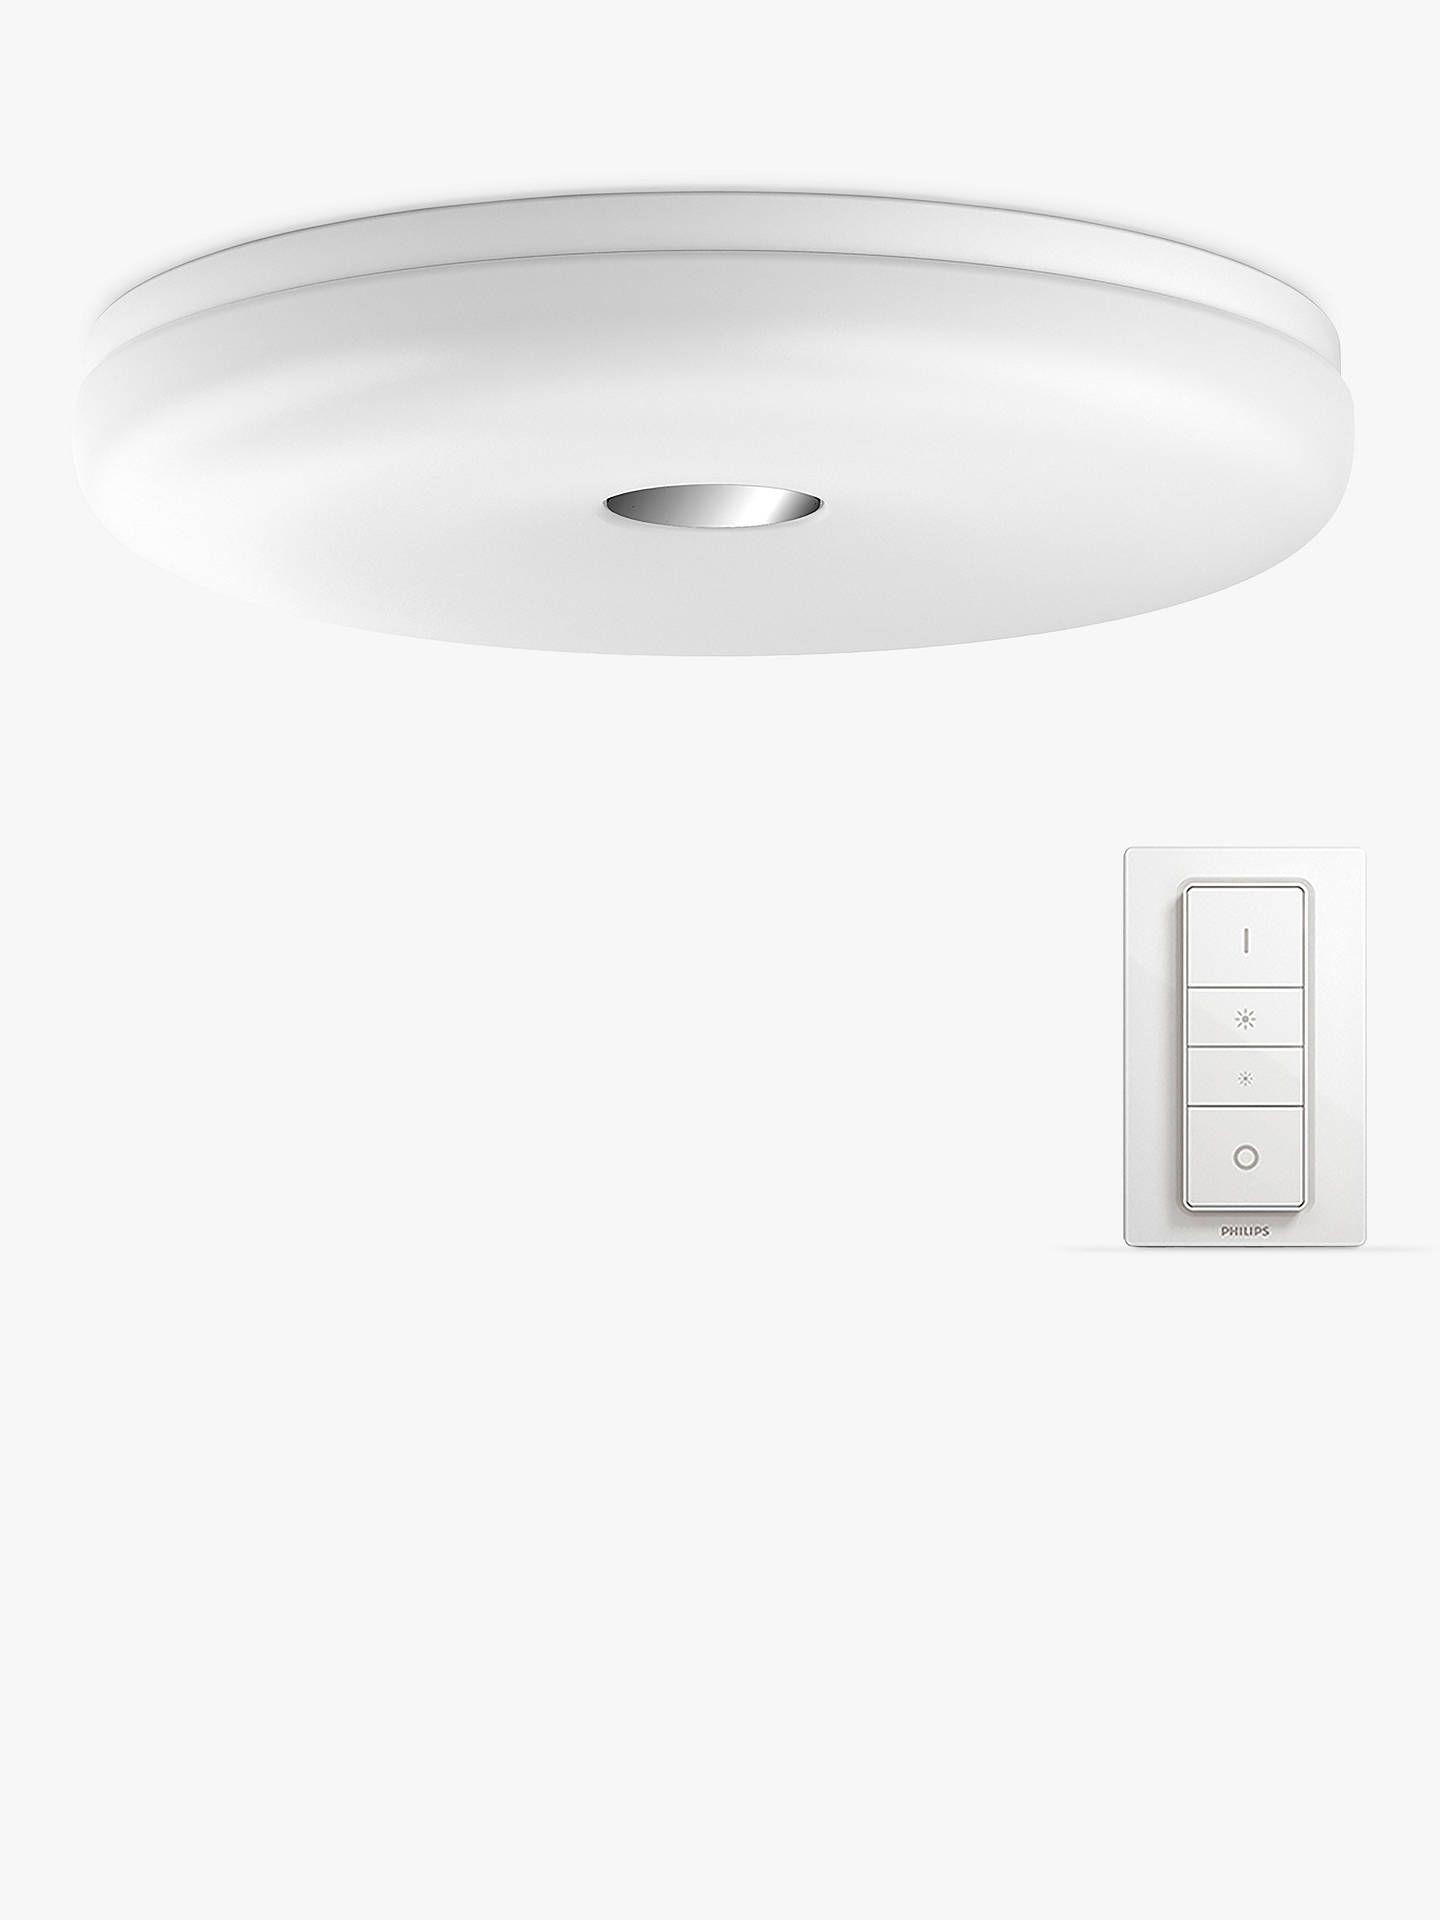 Philips Hue White Ambiance Struana Led Flush Bathroom Ceiling Light